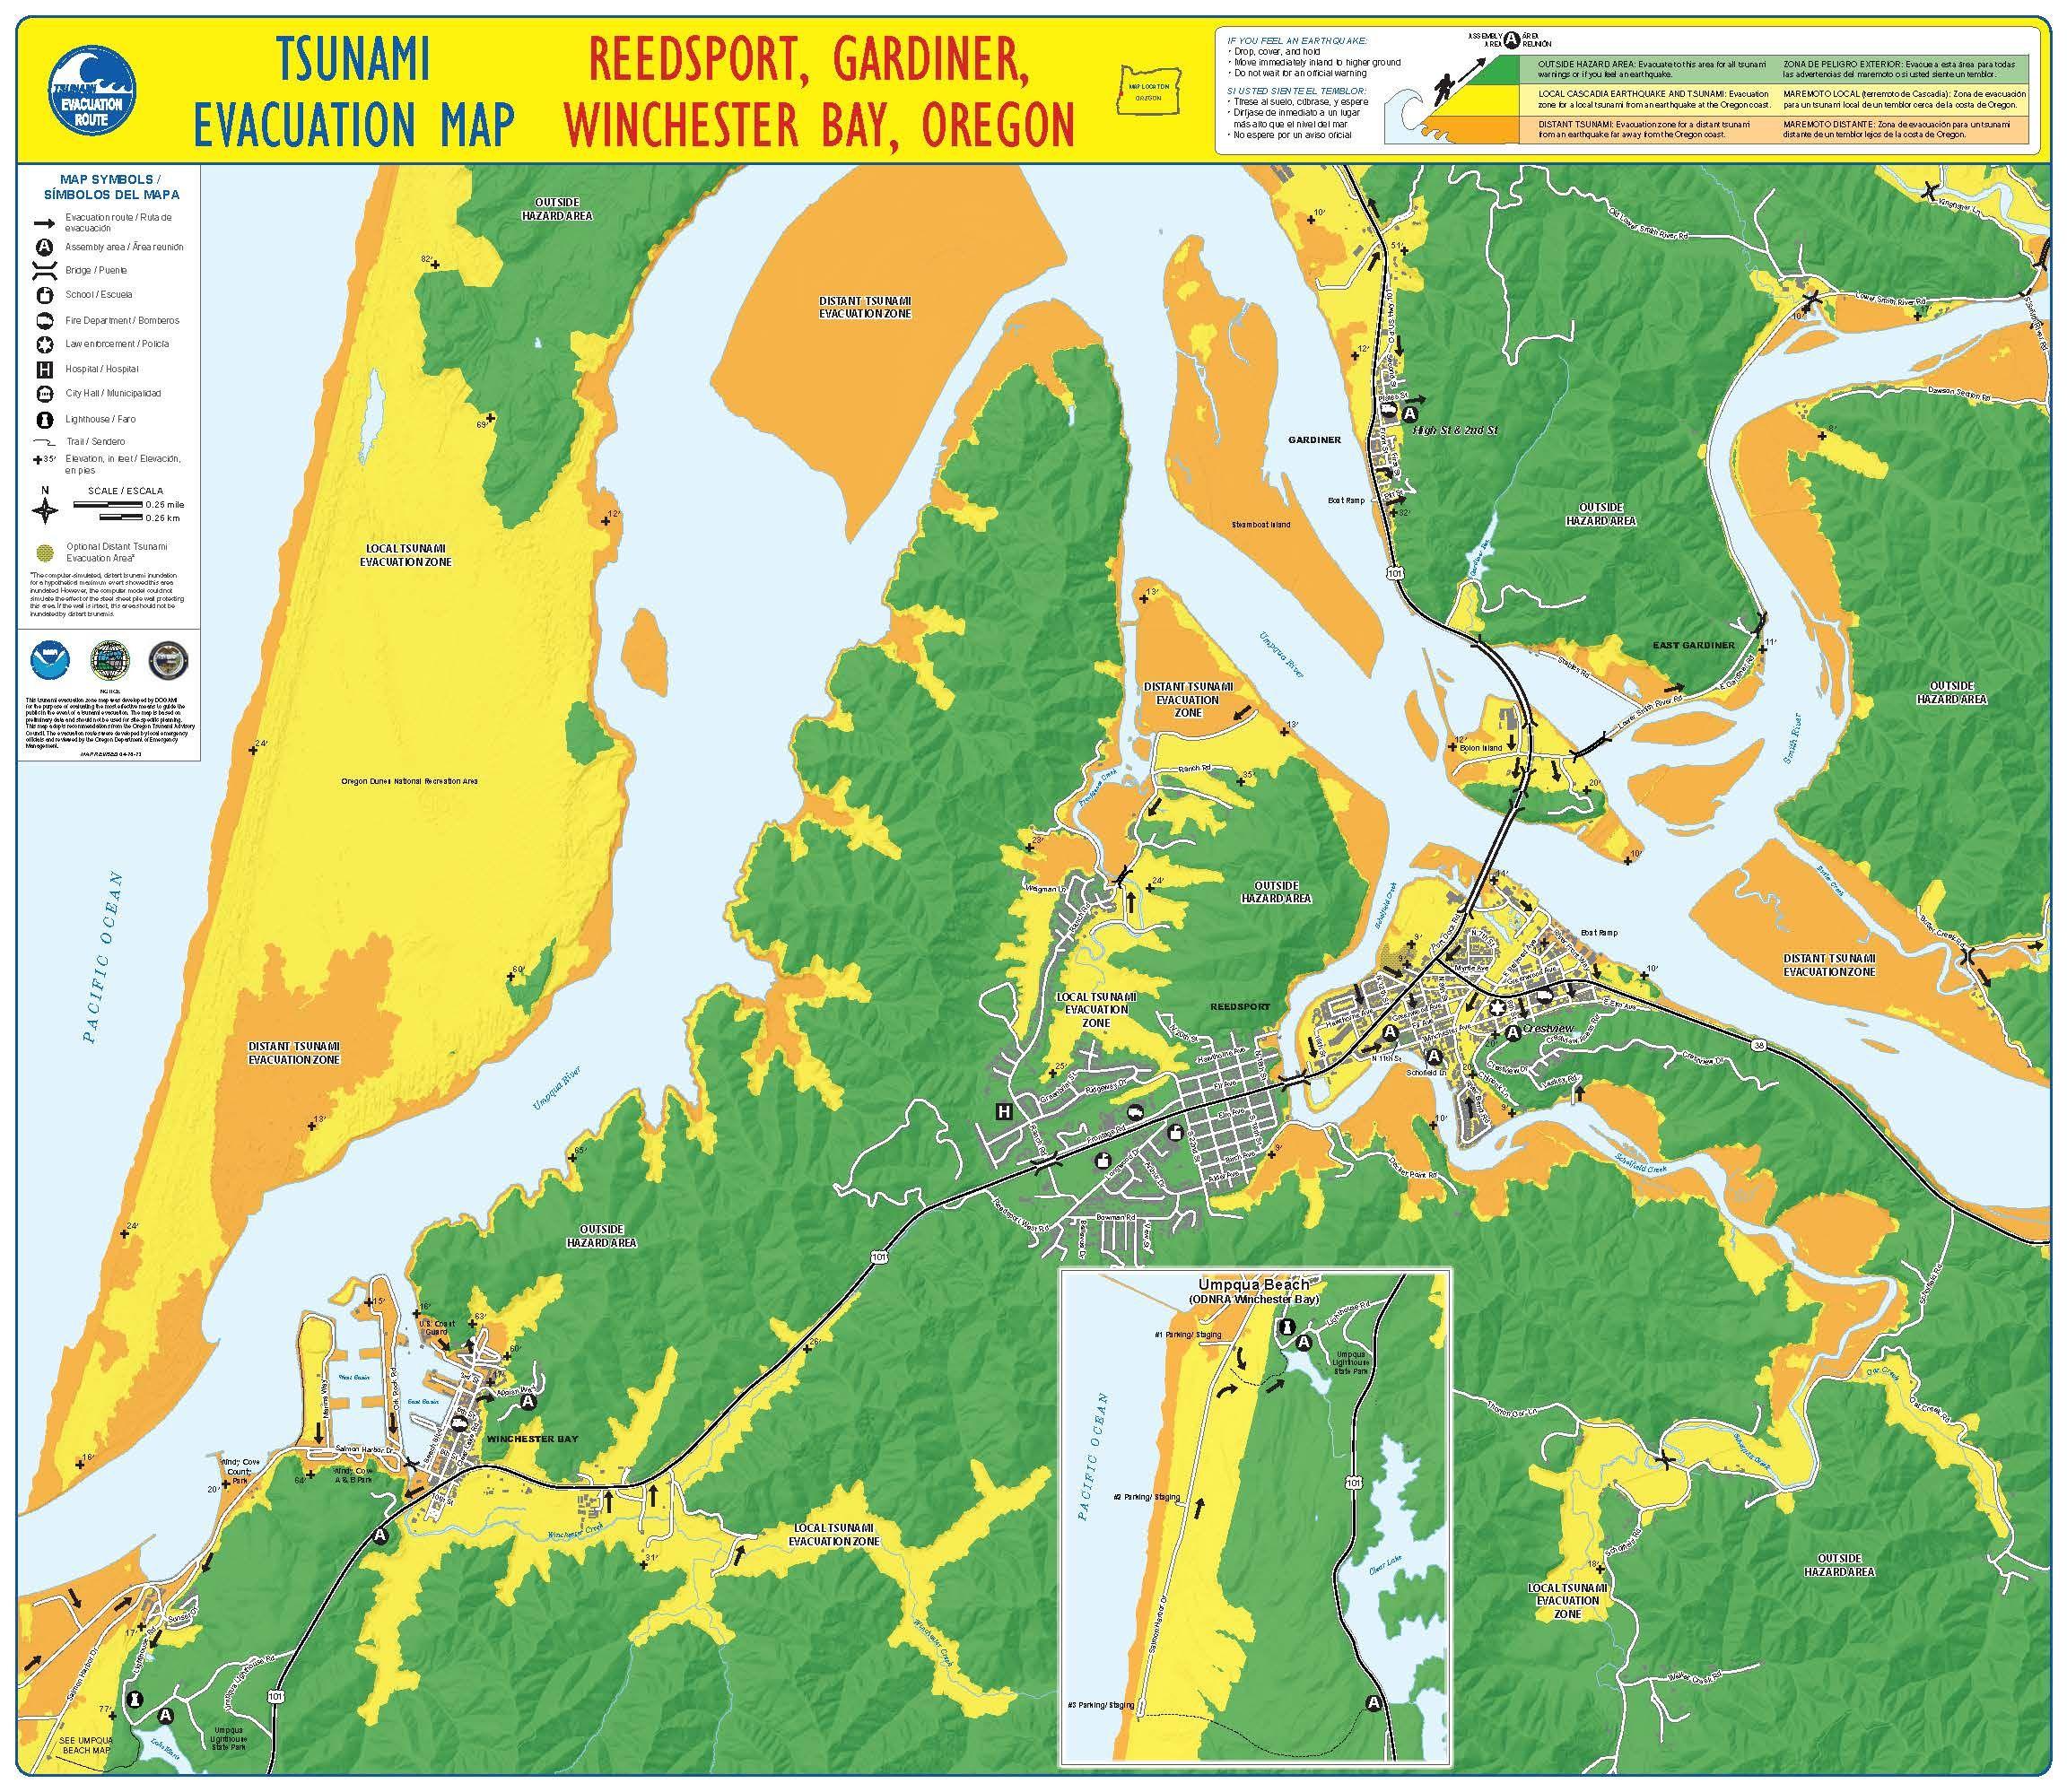 Tsunami evacuation map Reedsport Gardiner Winchester Bay